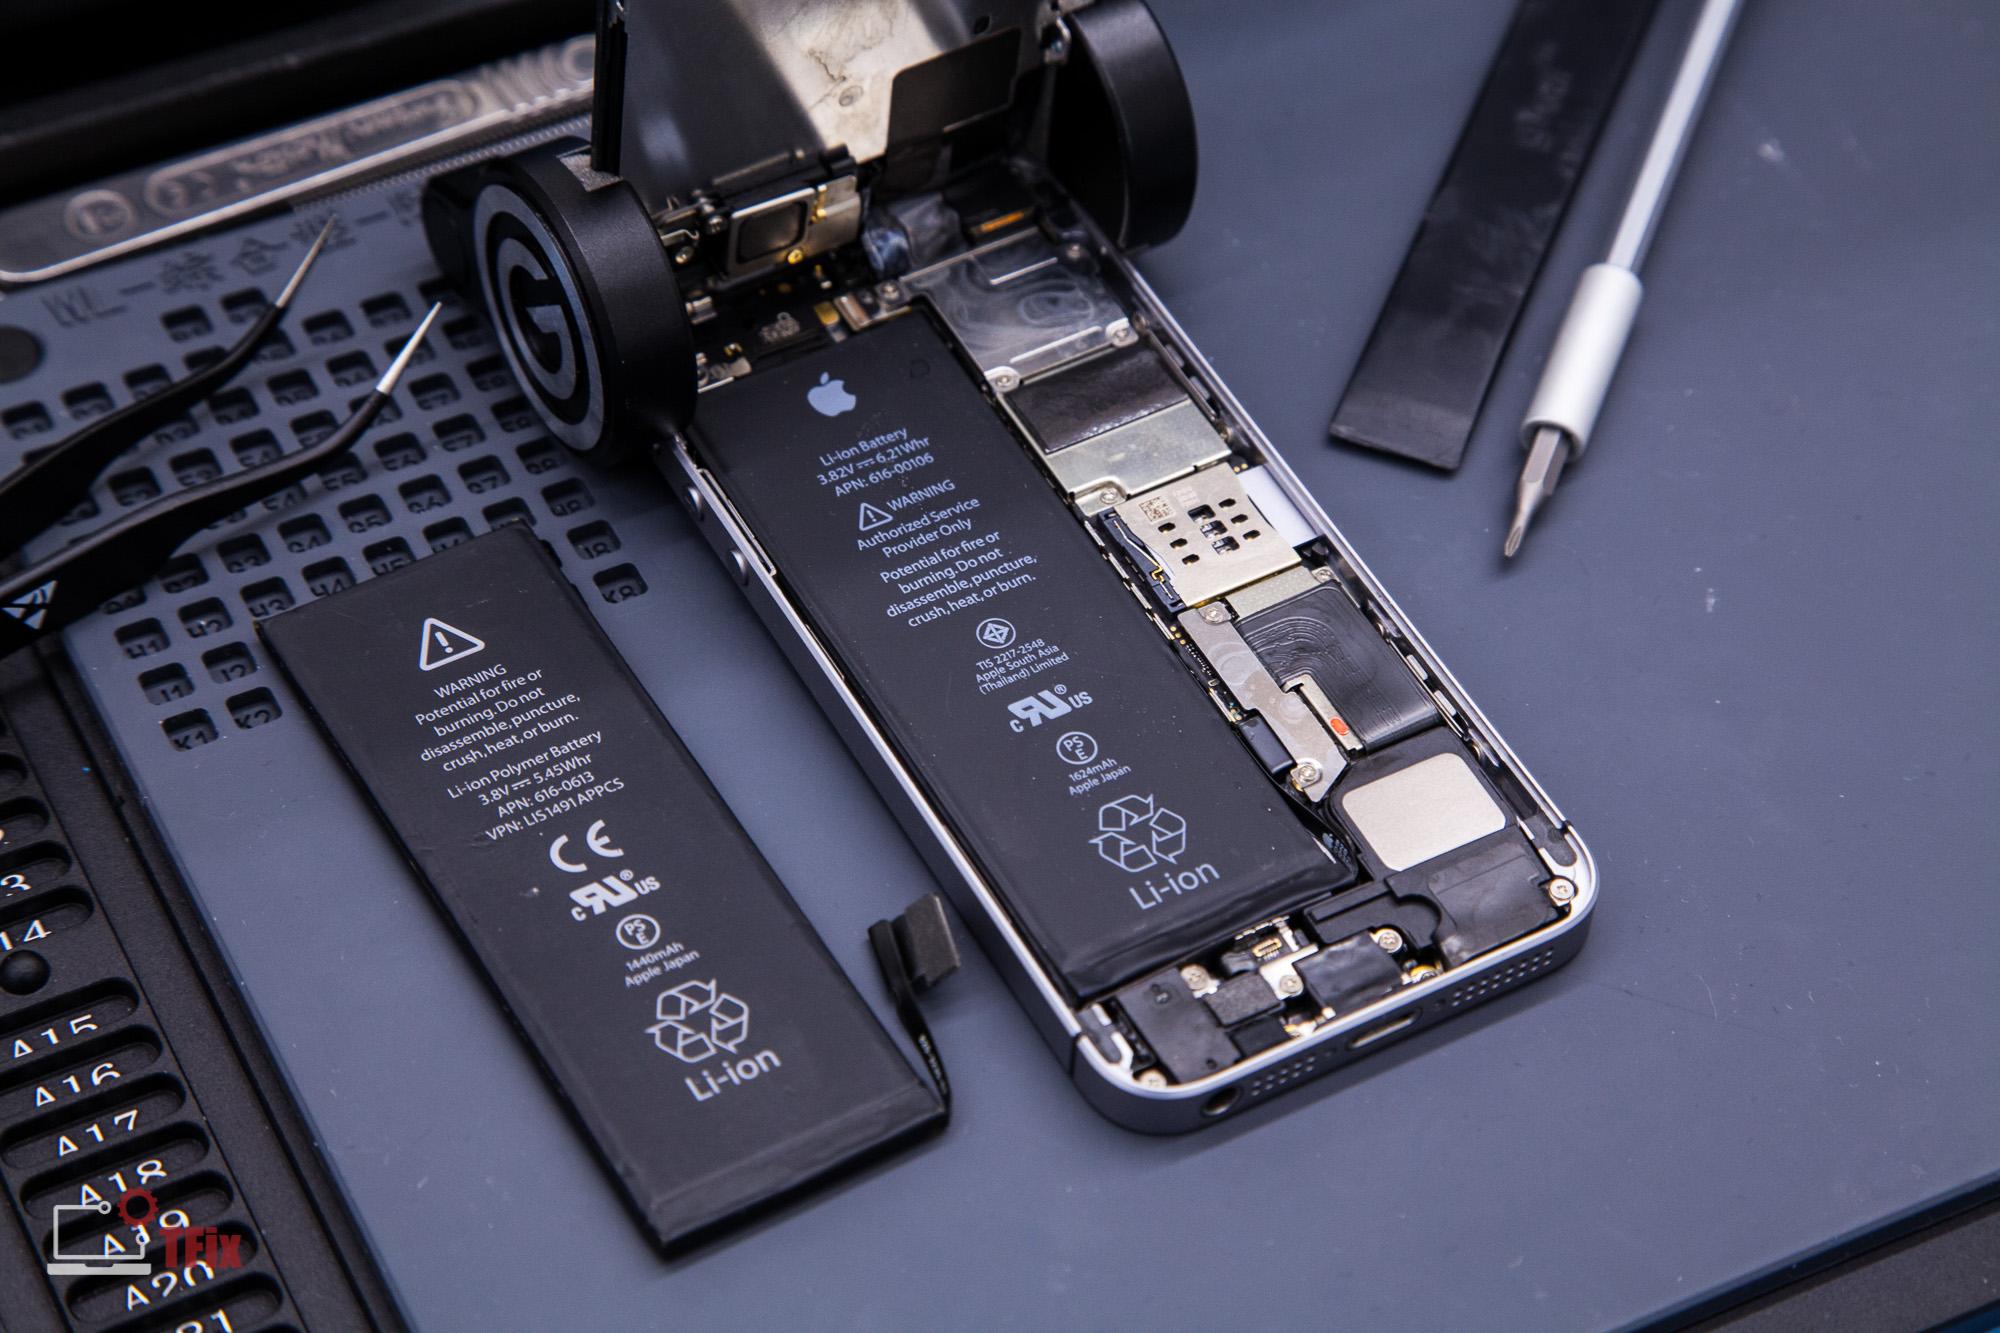 Journalist John Gruber made an assumption about weak iPhone sales in 2018